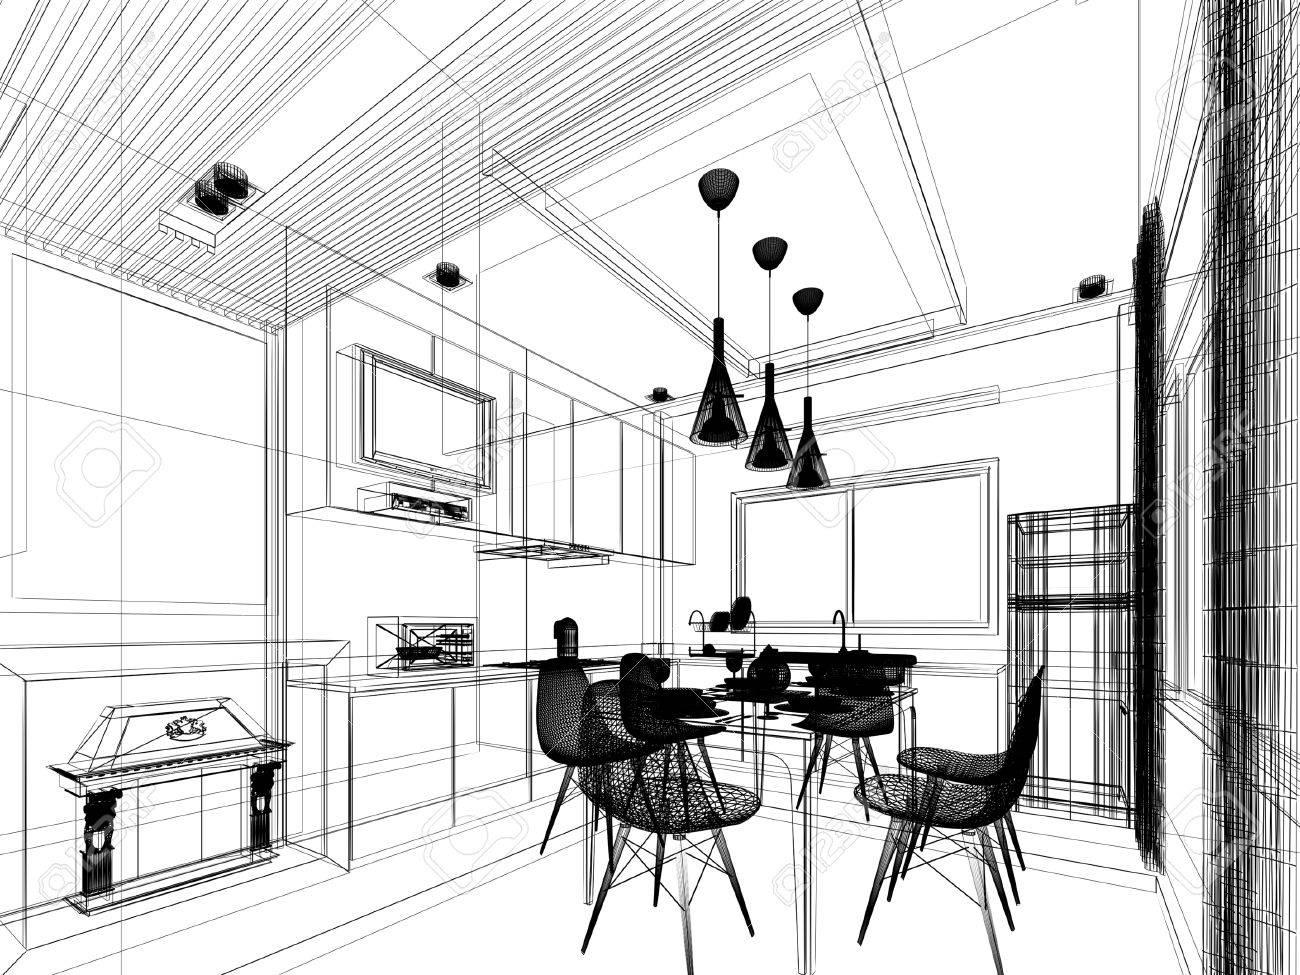 abstract sketch design of interior kitchen - 40904591